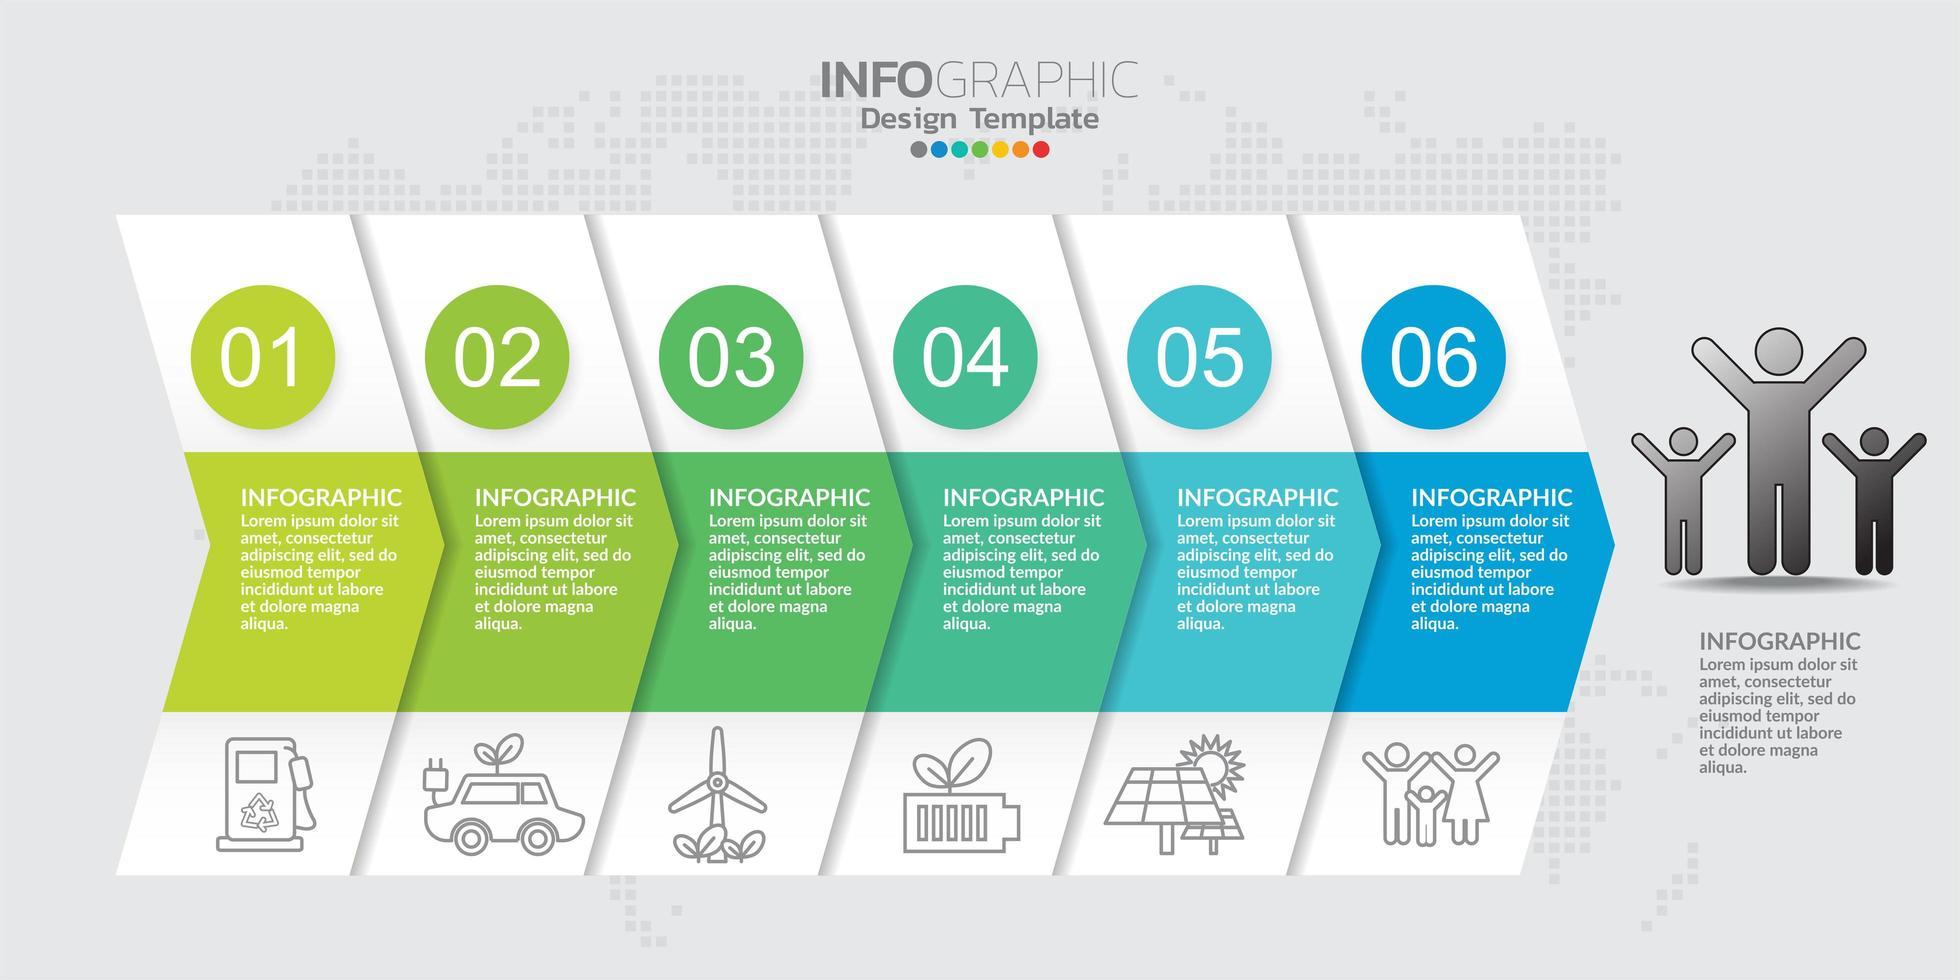 Infographic elements for content, diagram, flowchart, steps, parts, timeline, workflow, chart. vector